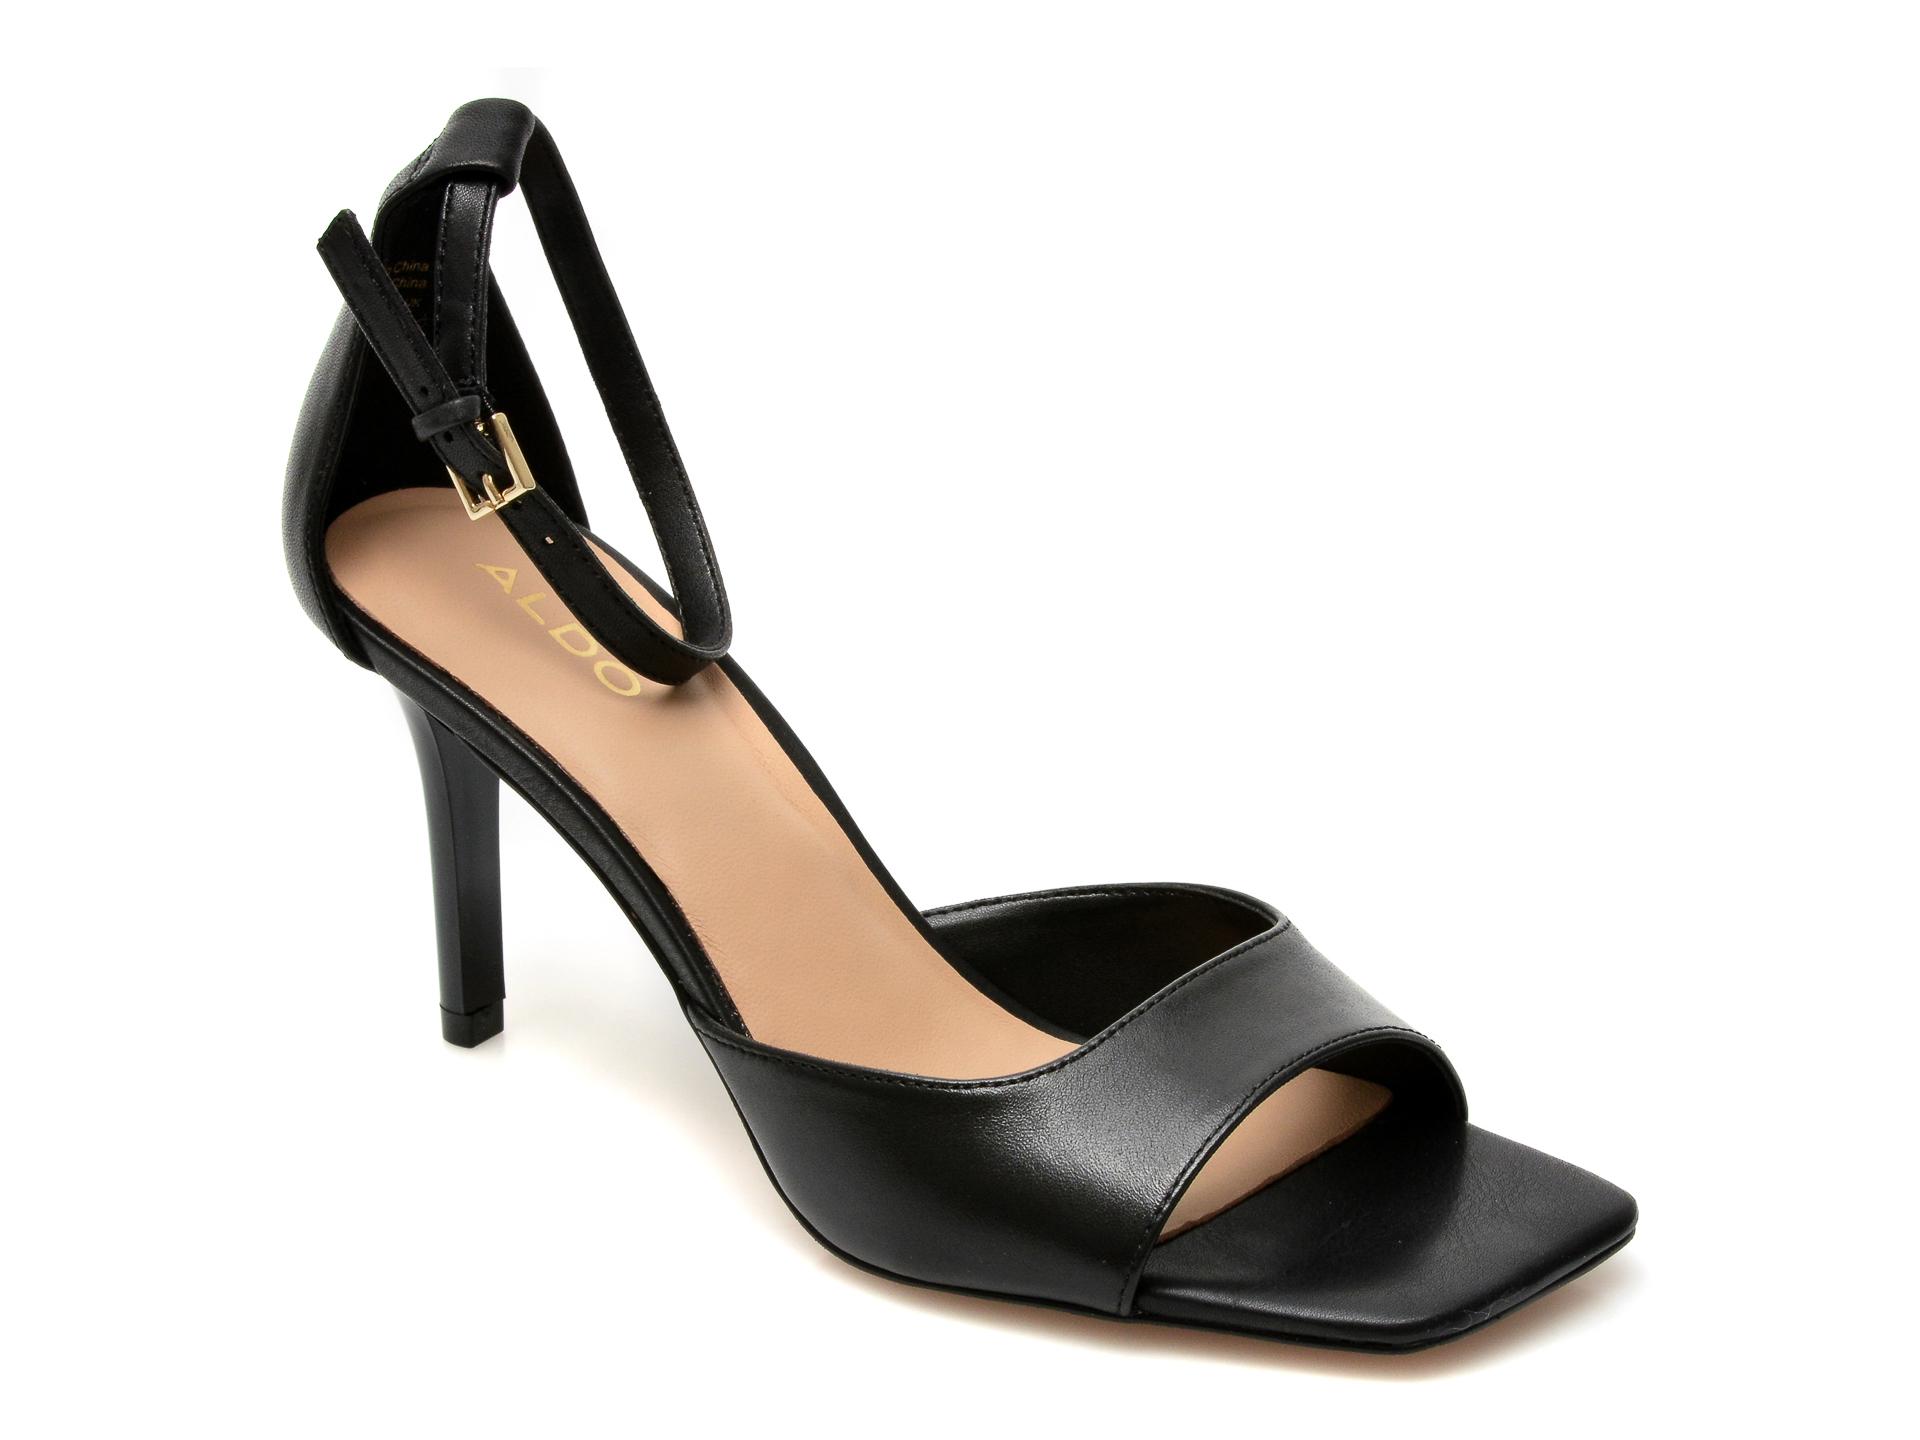 Sandale ALDO negre, Asteama001, din piele naturala New